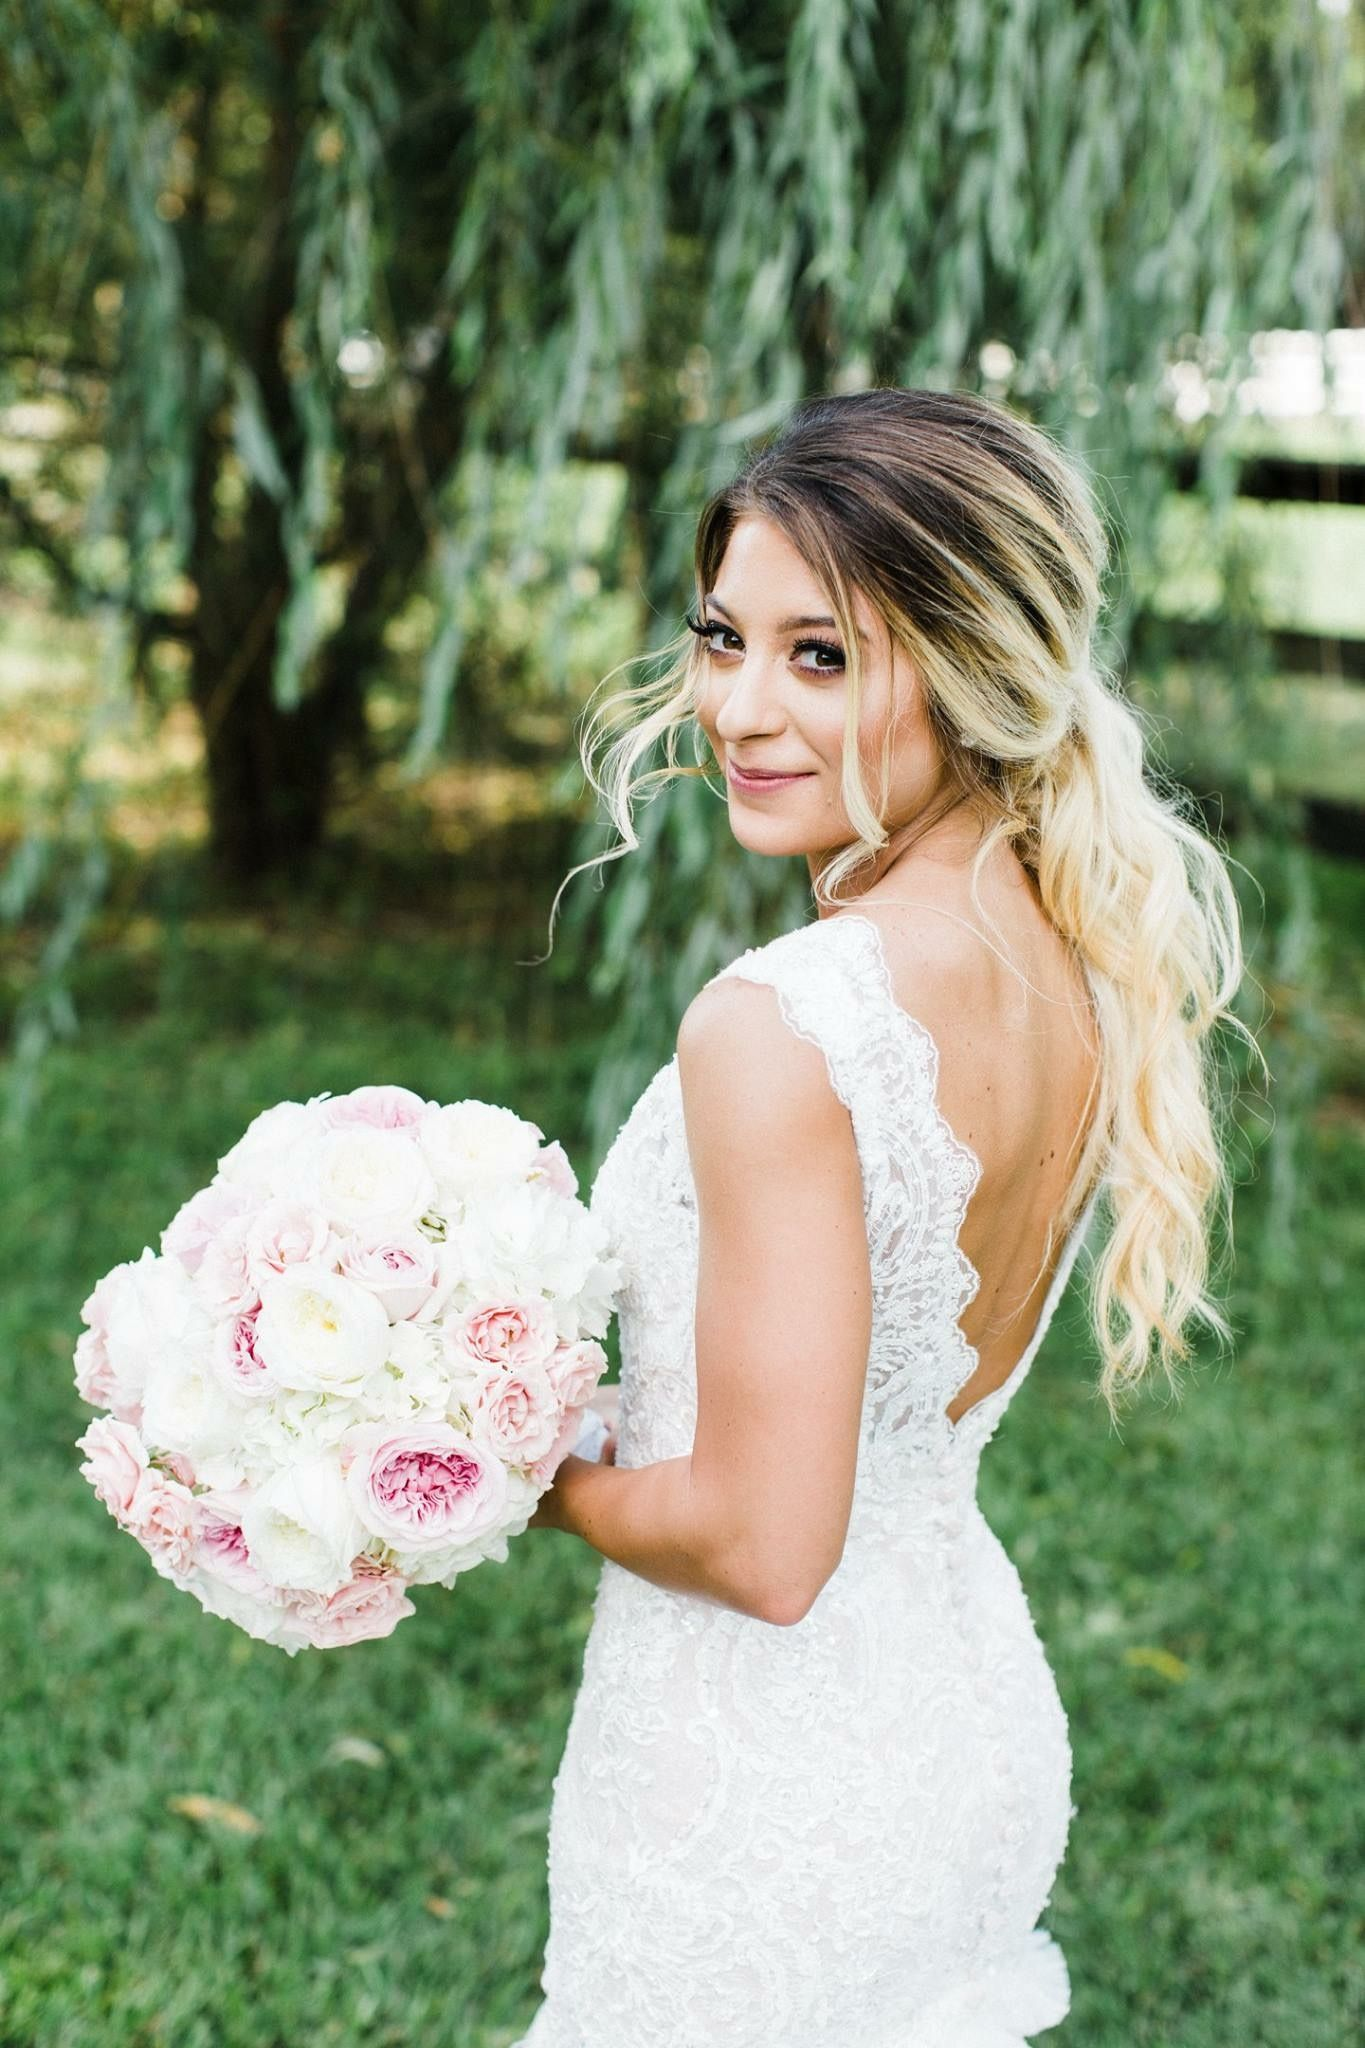 Bridal ponytail hairstyle wedding lace lace weddings